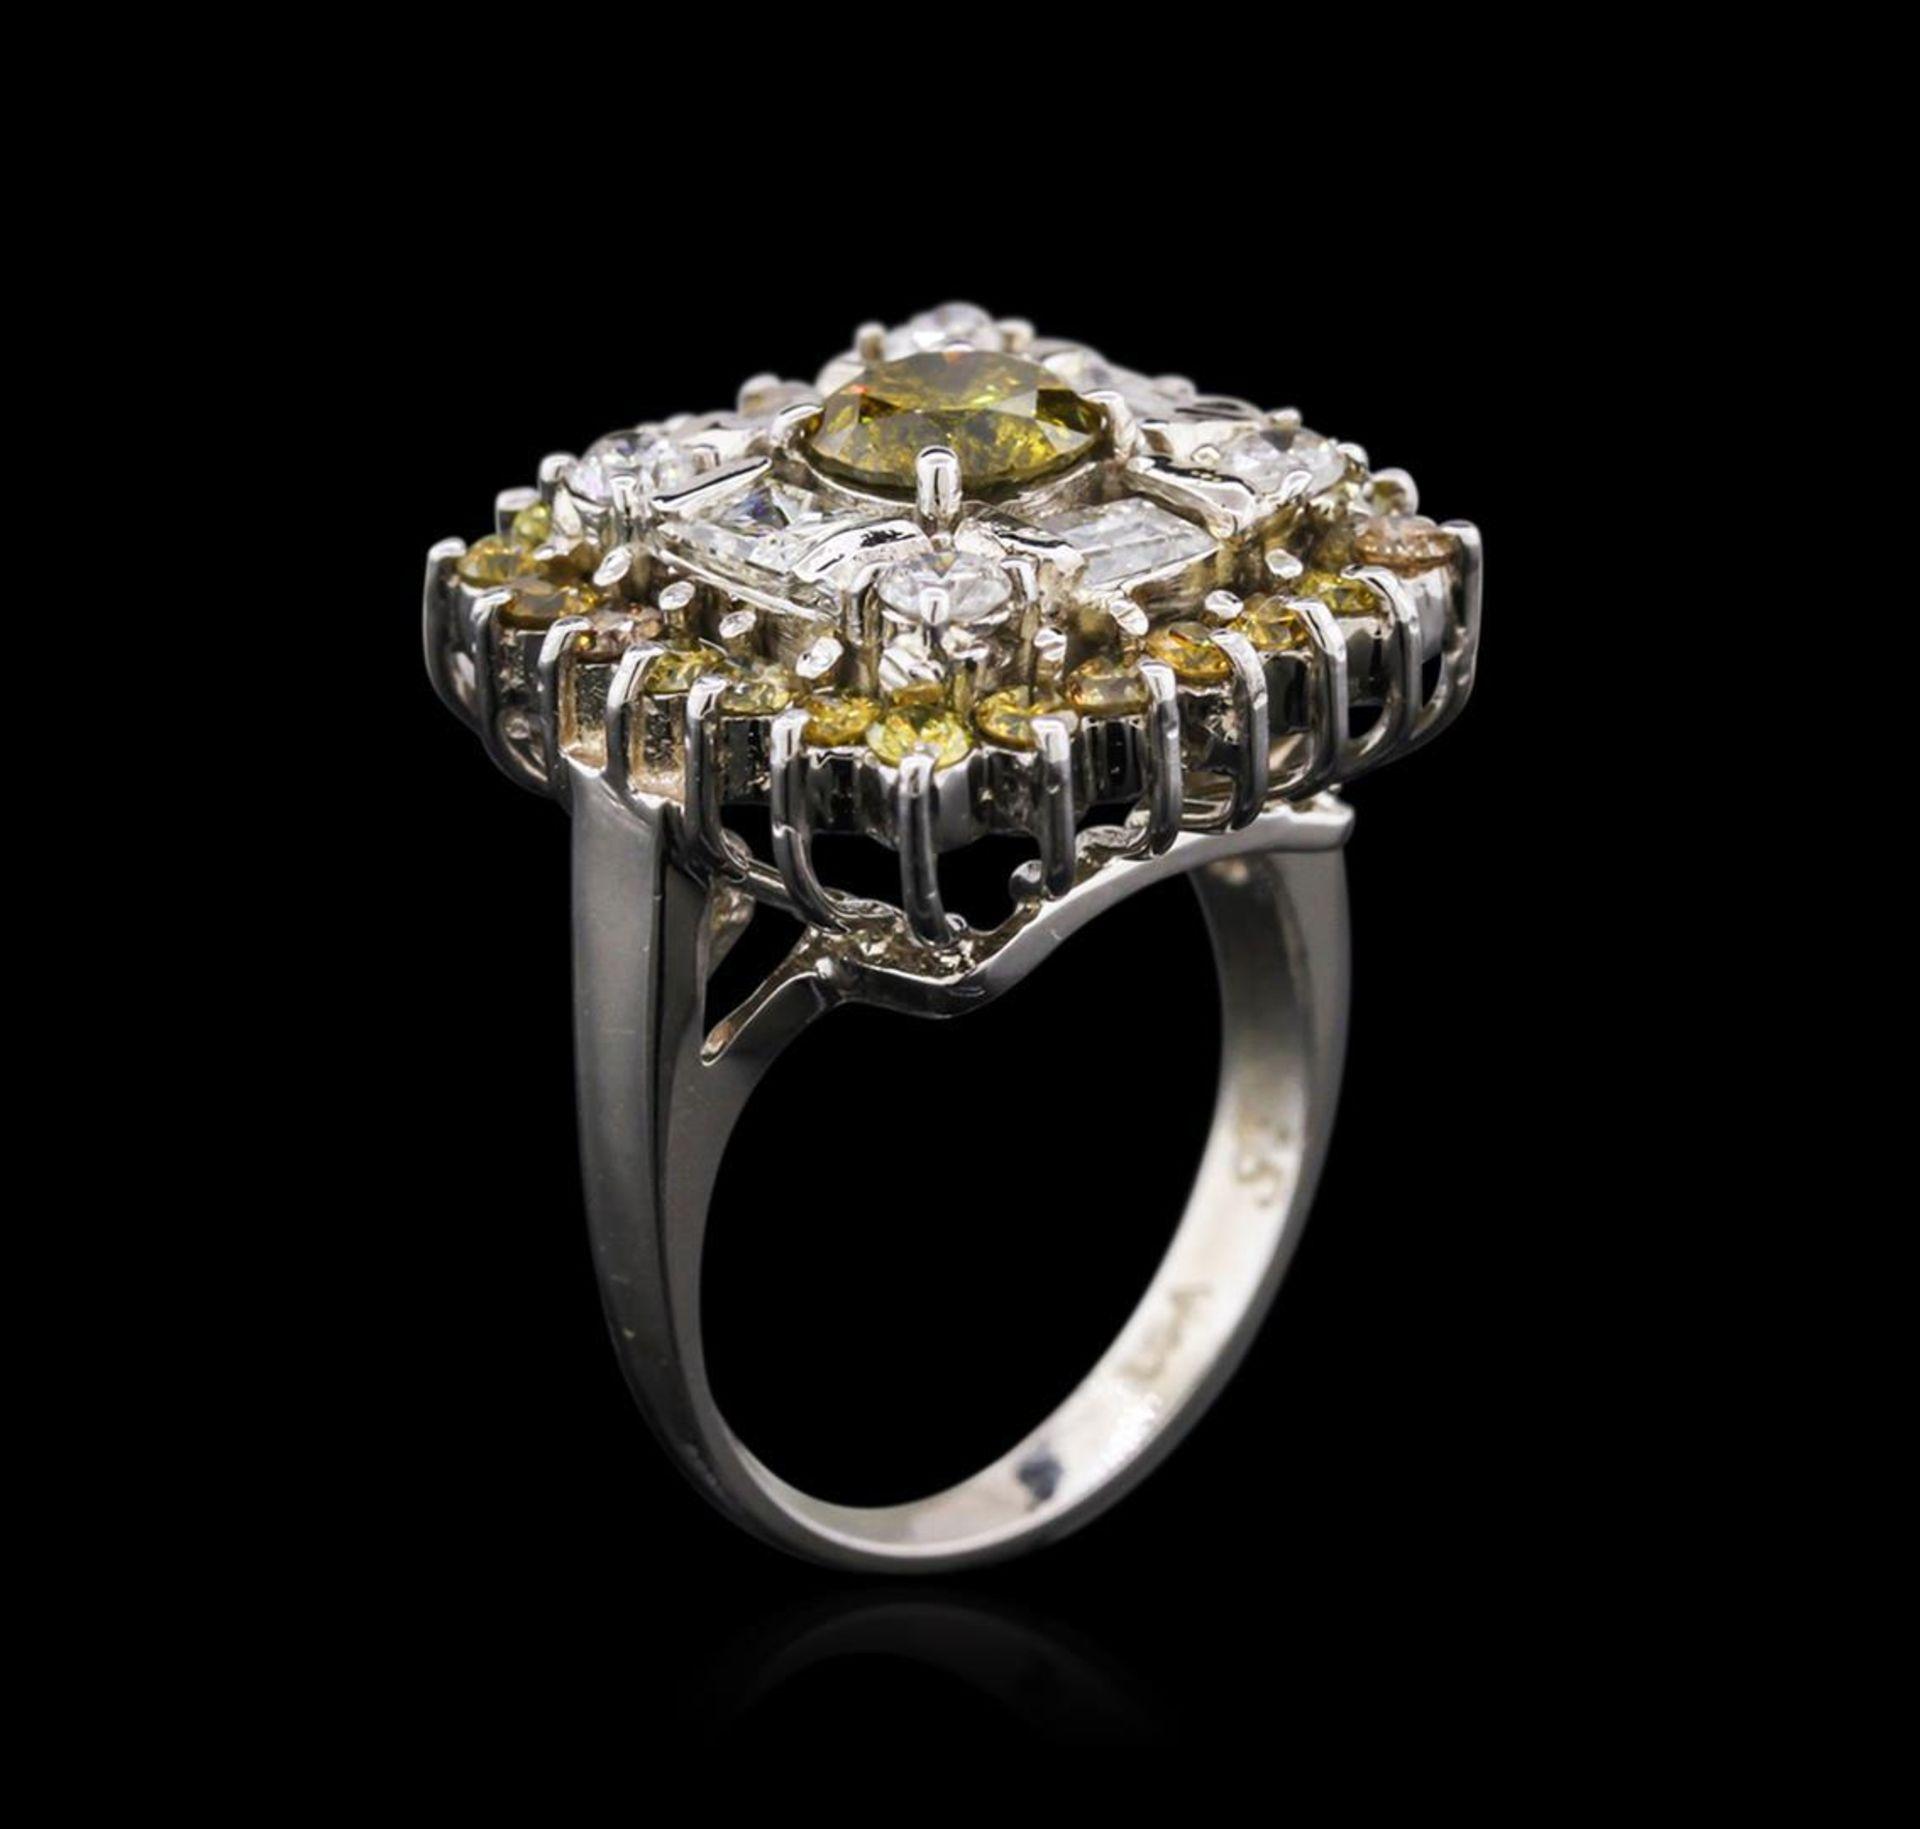 14KT White Gold 2.93 ctw Diamond Ring - Image 3 of 4